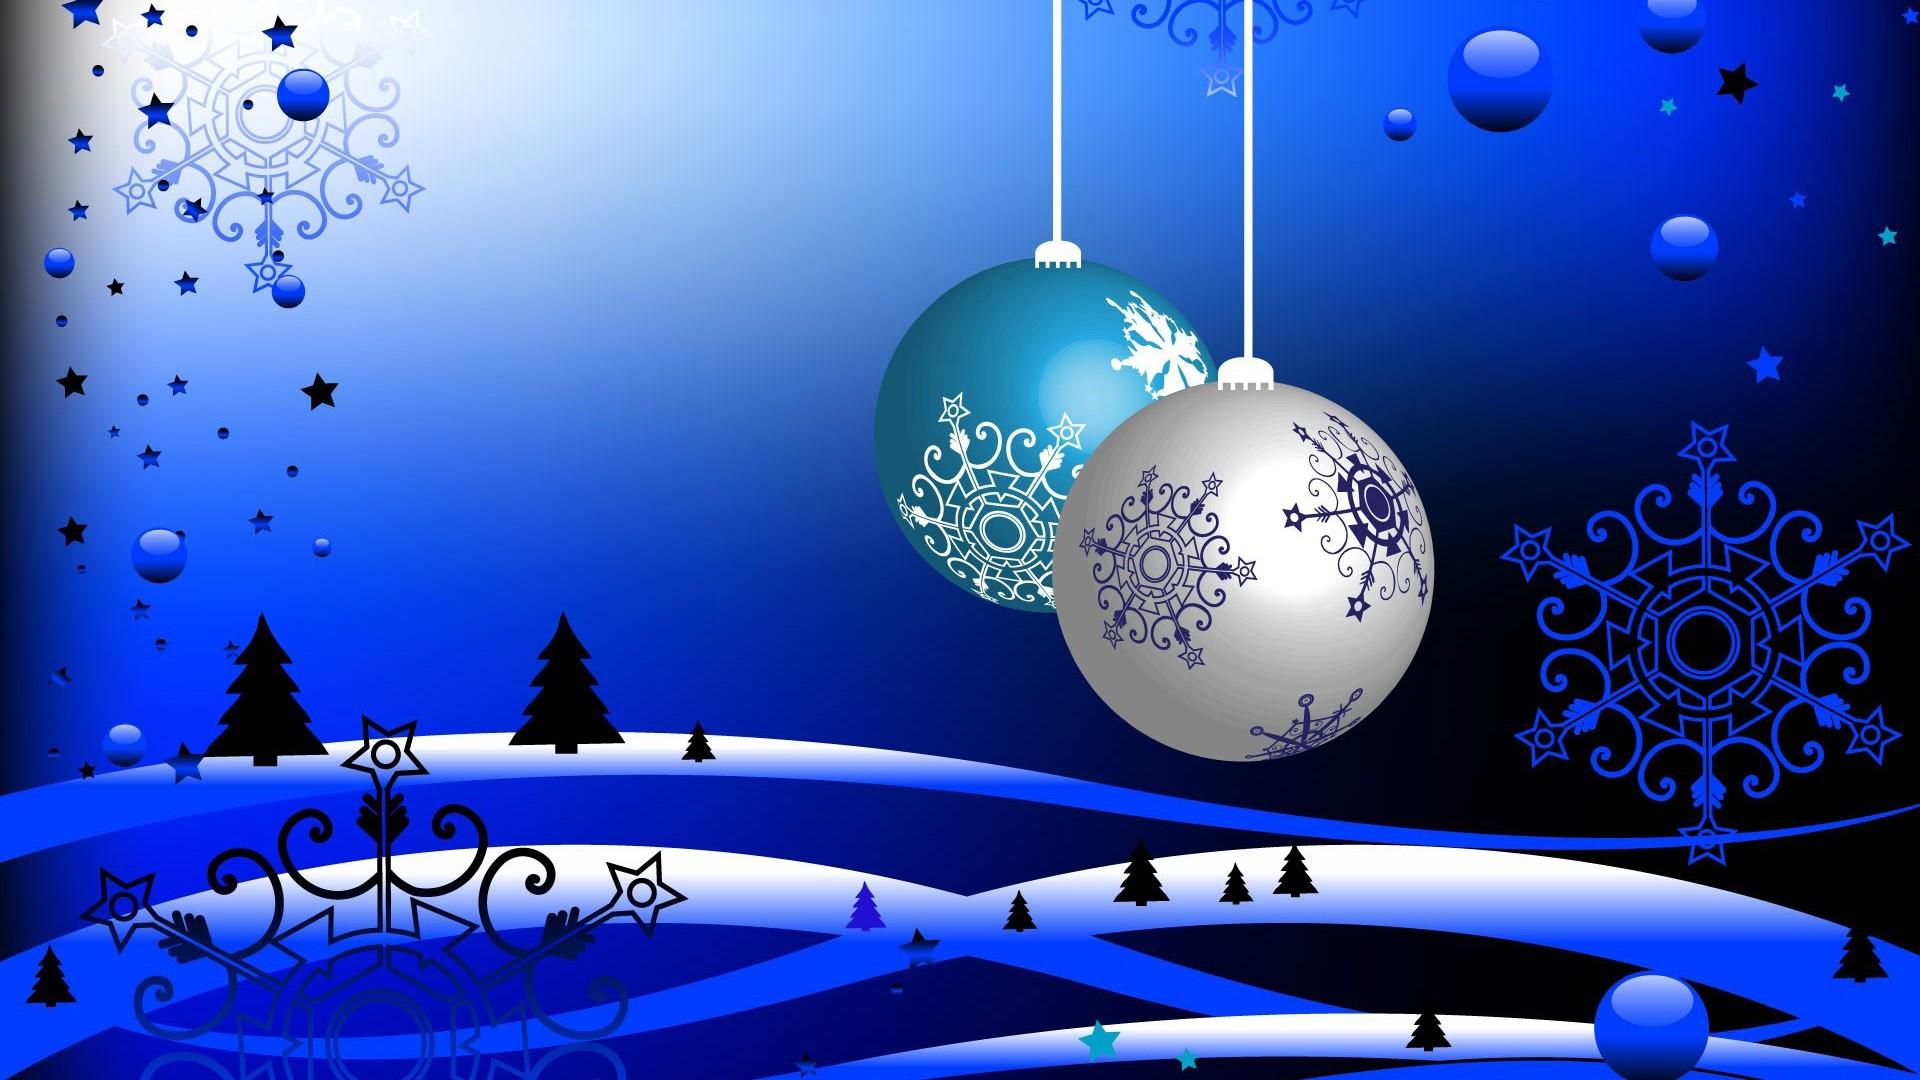 Animated Christmas Desktop Wallpaper 54 Images